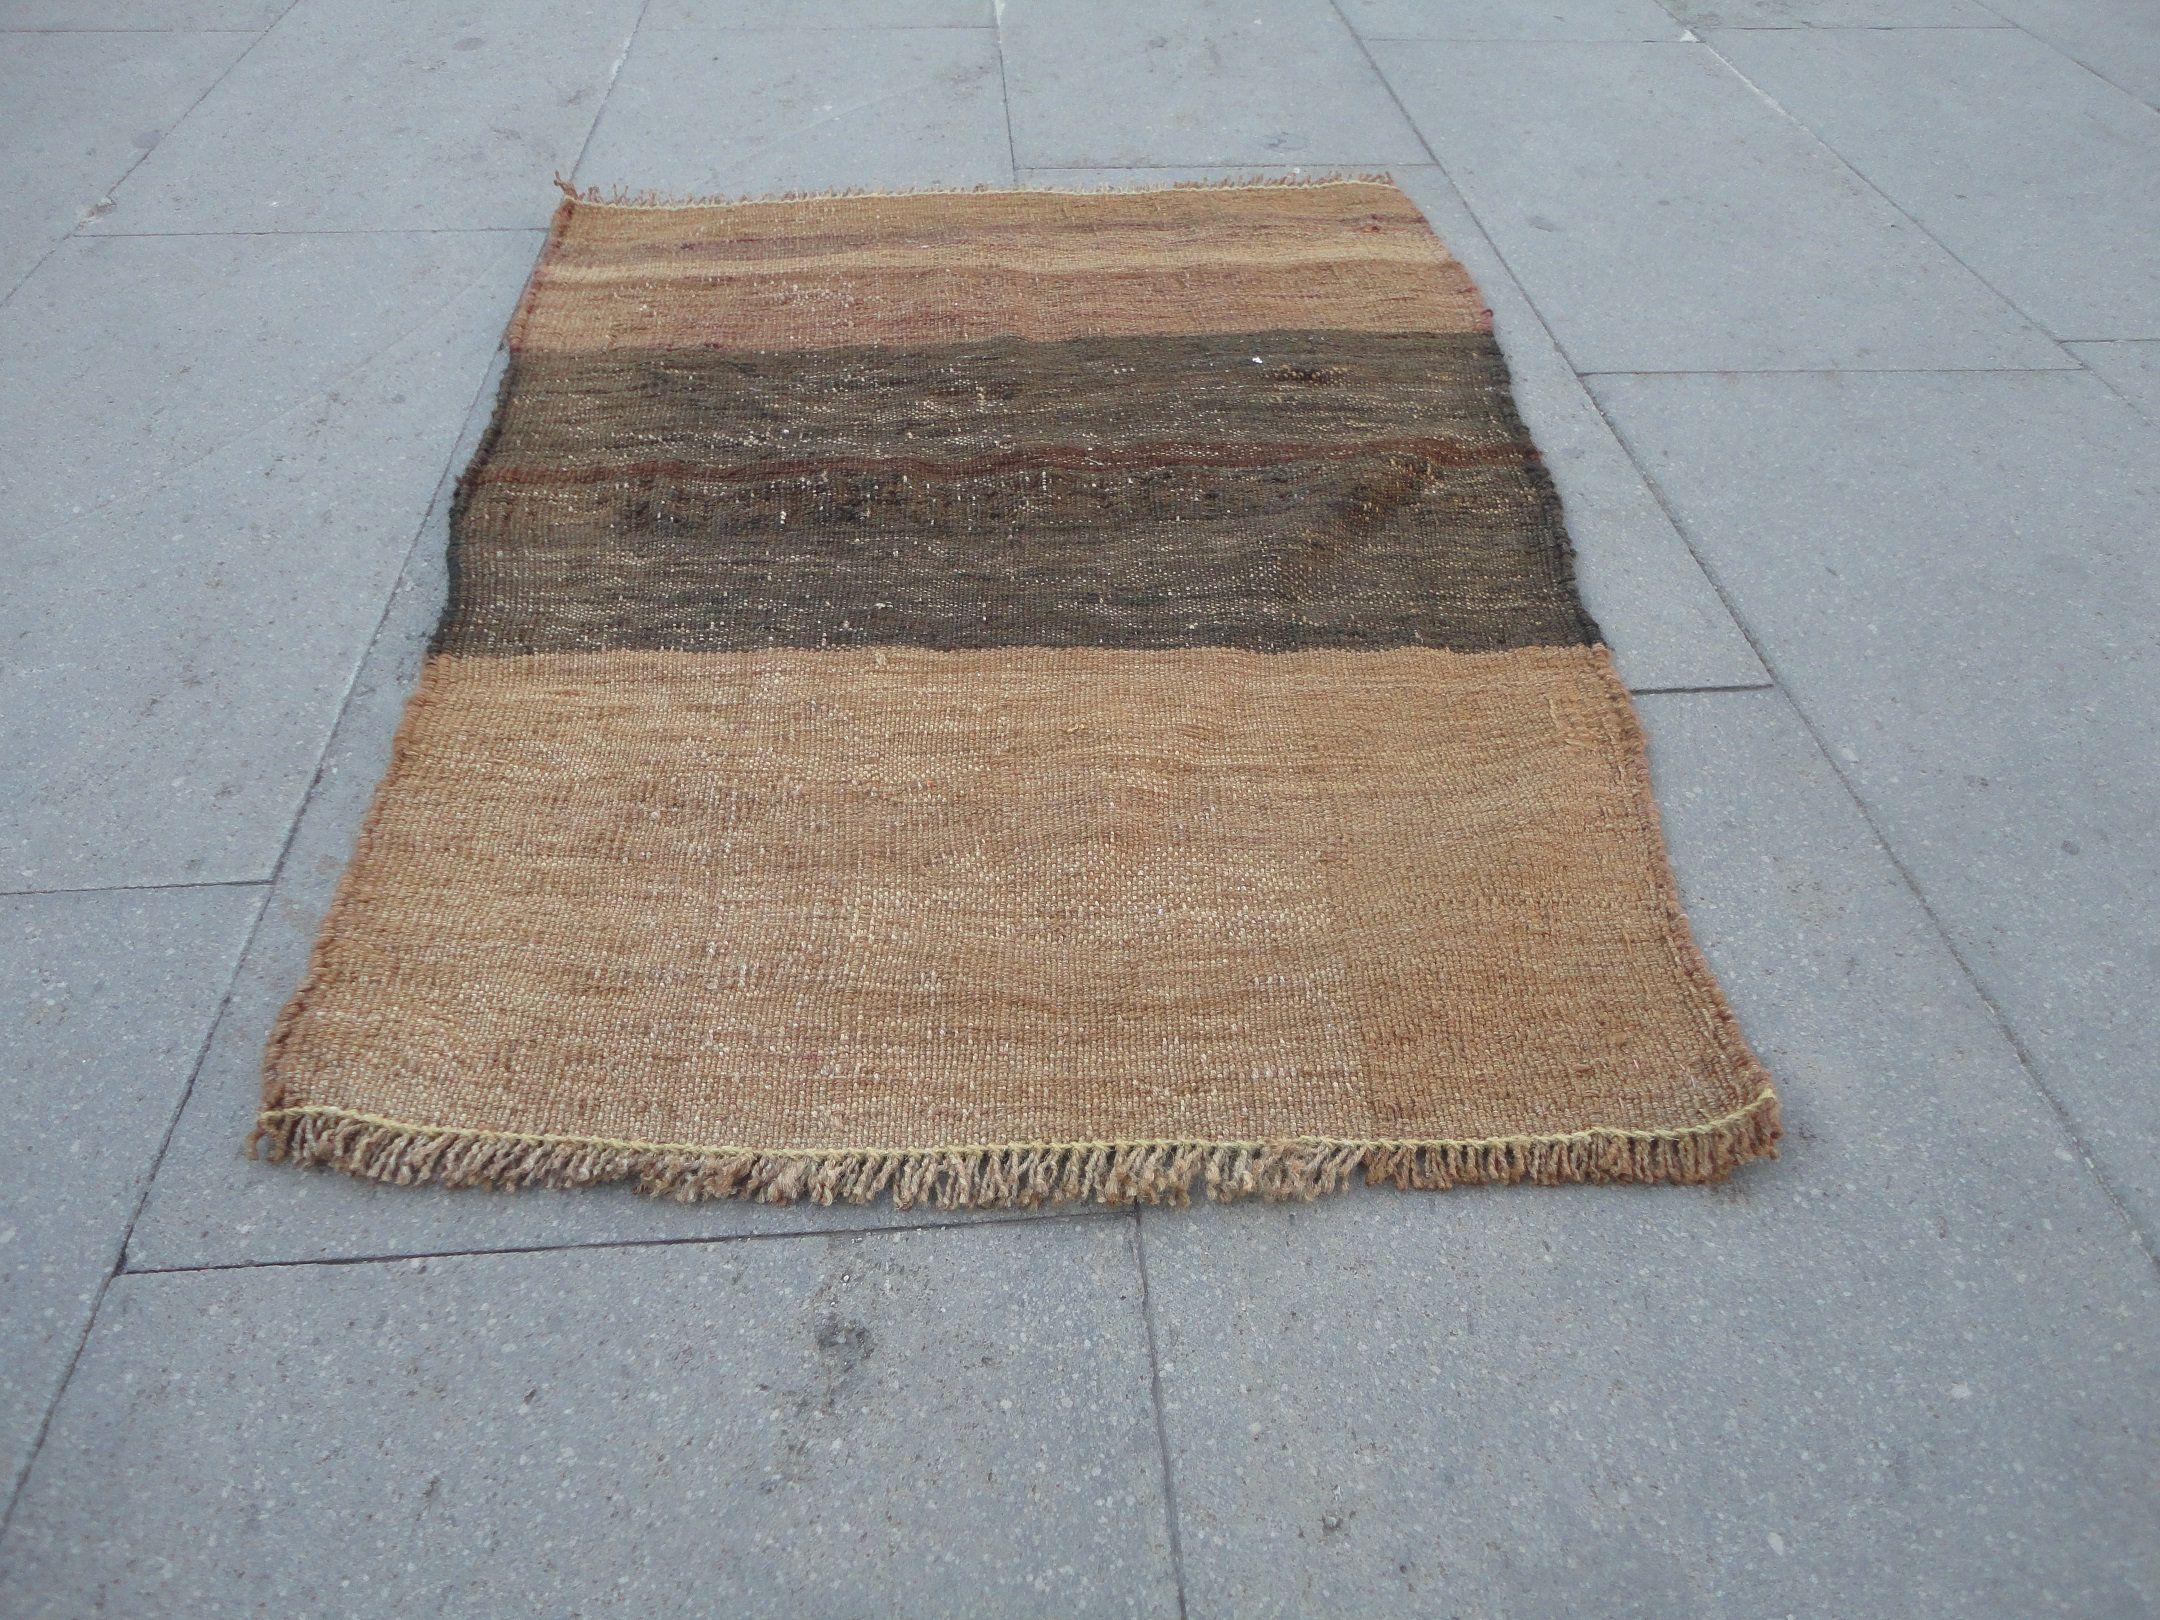 Brown Small Kilim Rug Vintage Doormat Christmas Gift Rug Hand Weaving Rug Mat Entrance Turkish Wool Boho Kilim Carpet 2 5 X 1 8 Ft R Kilims Halilar Kilim